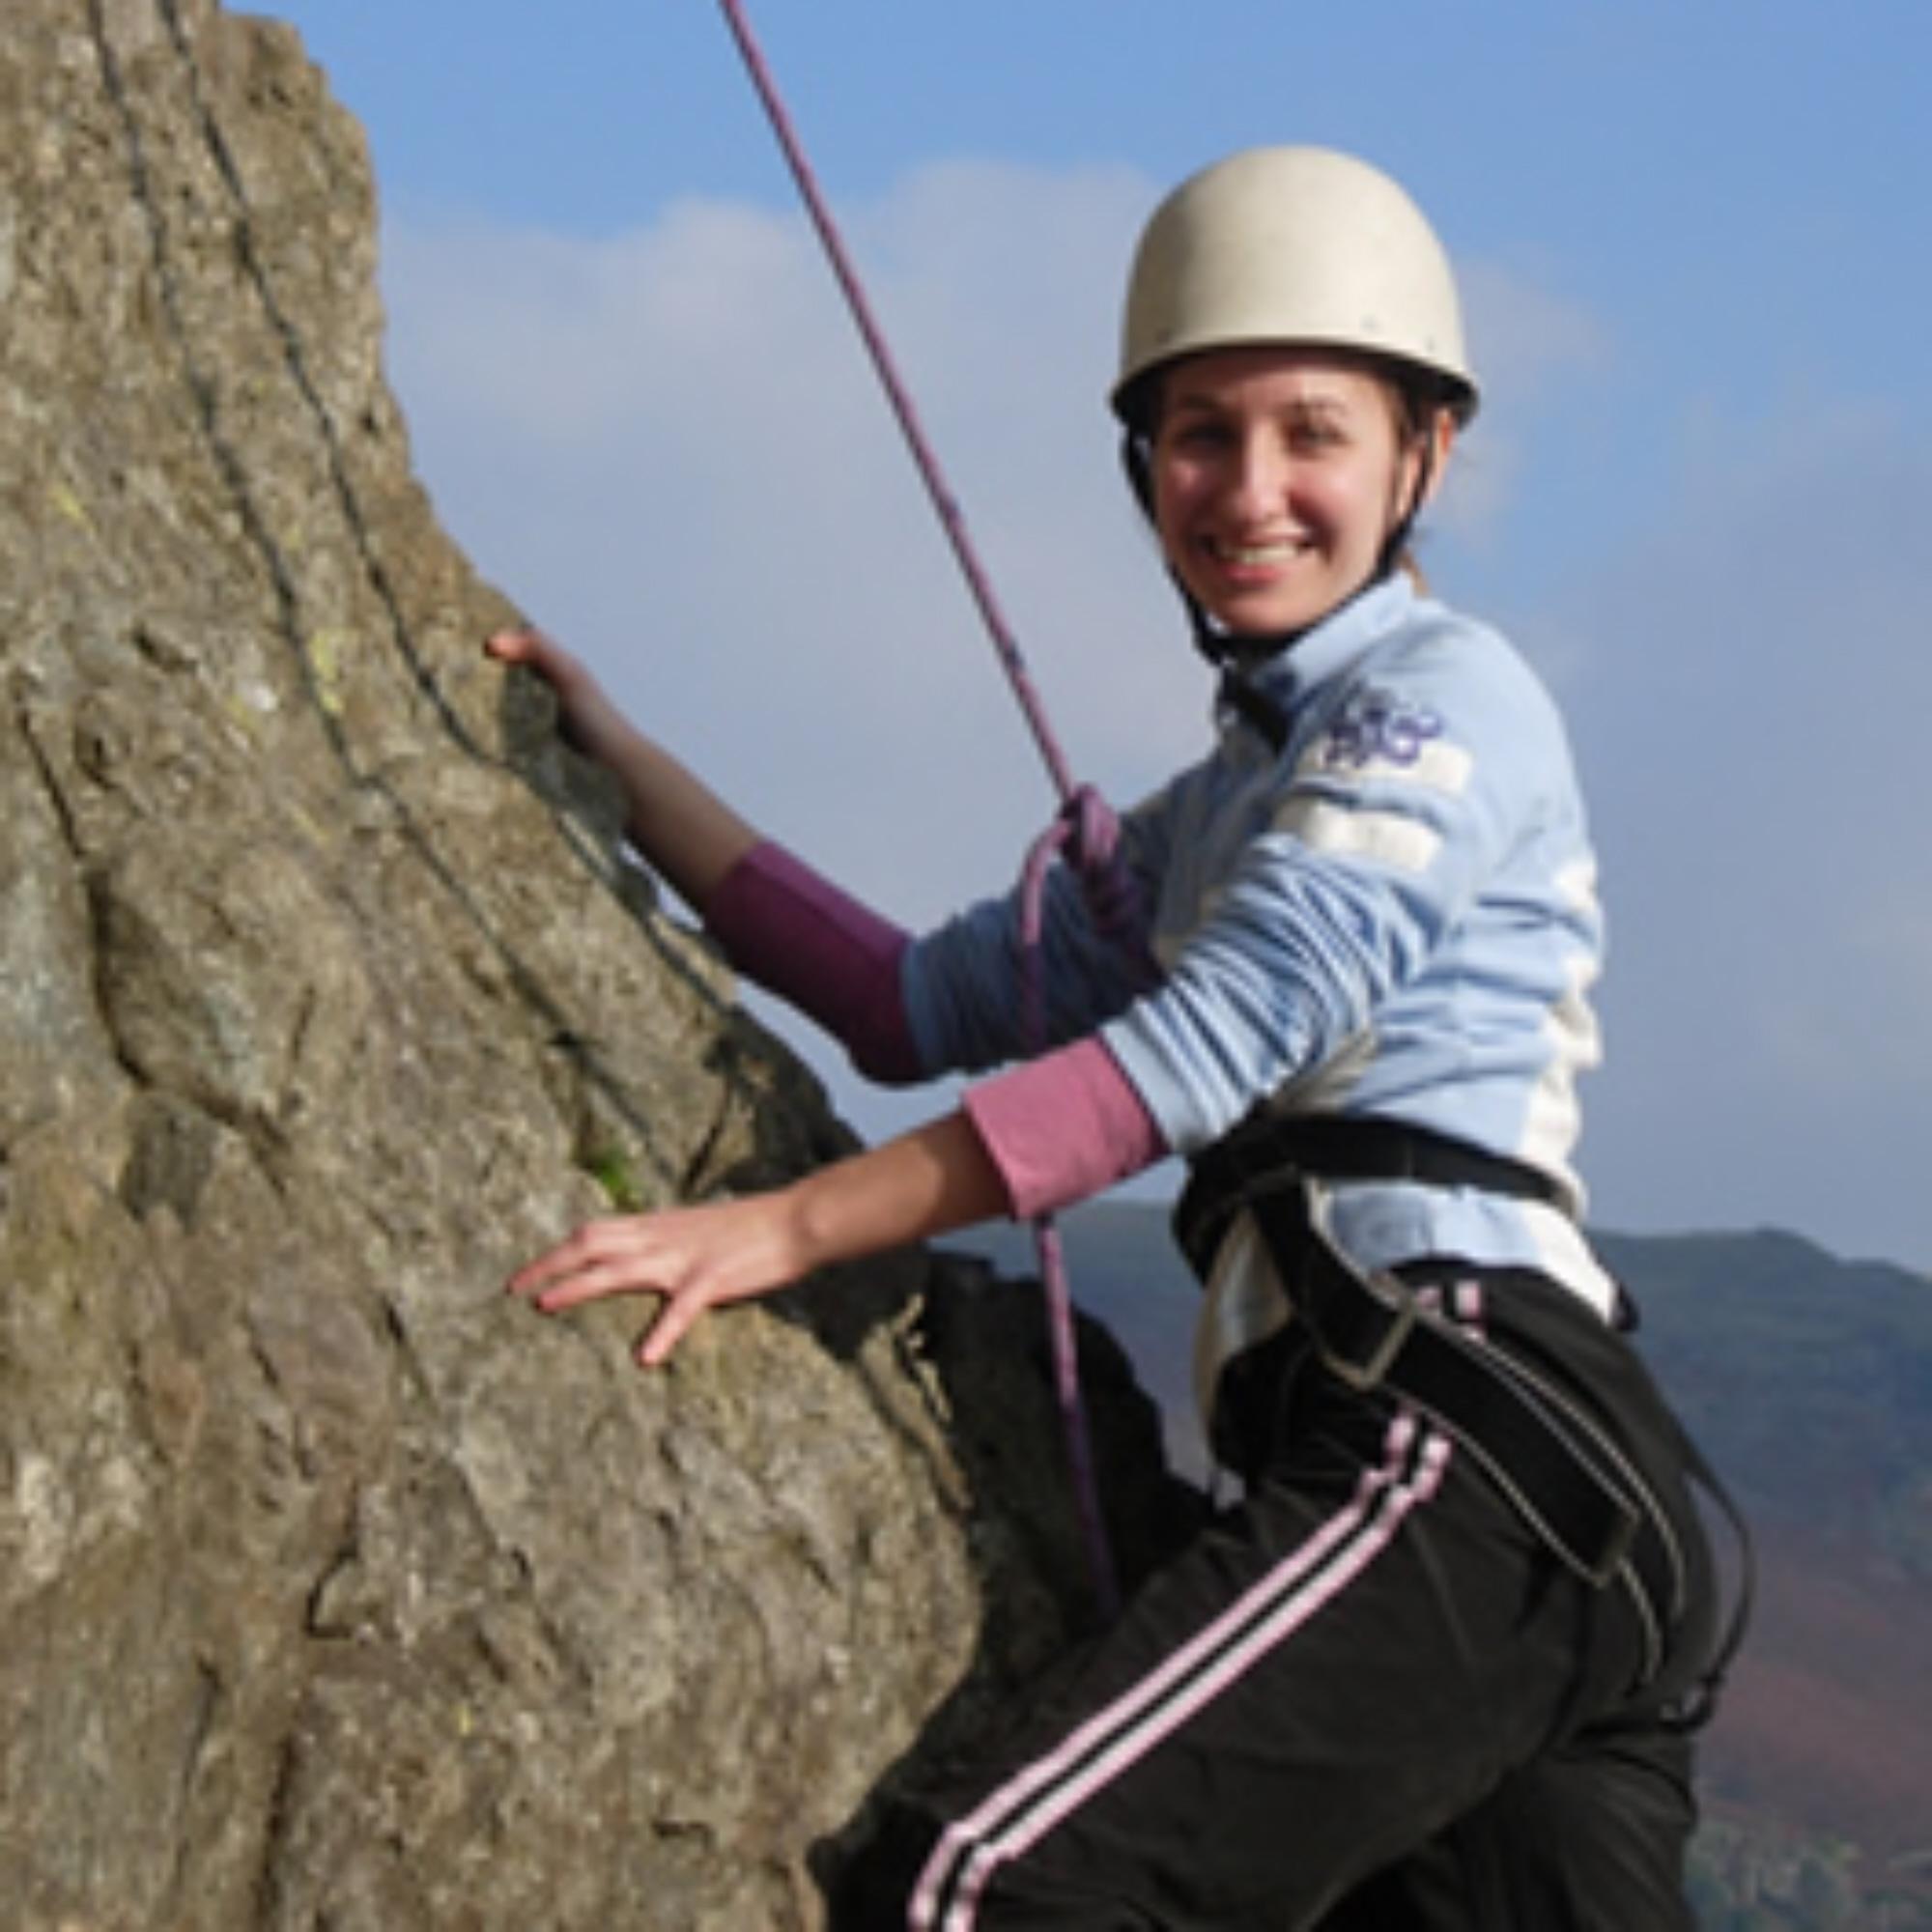 Rock climbing course Lake Disrict